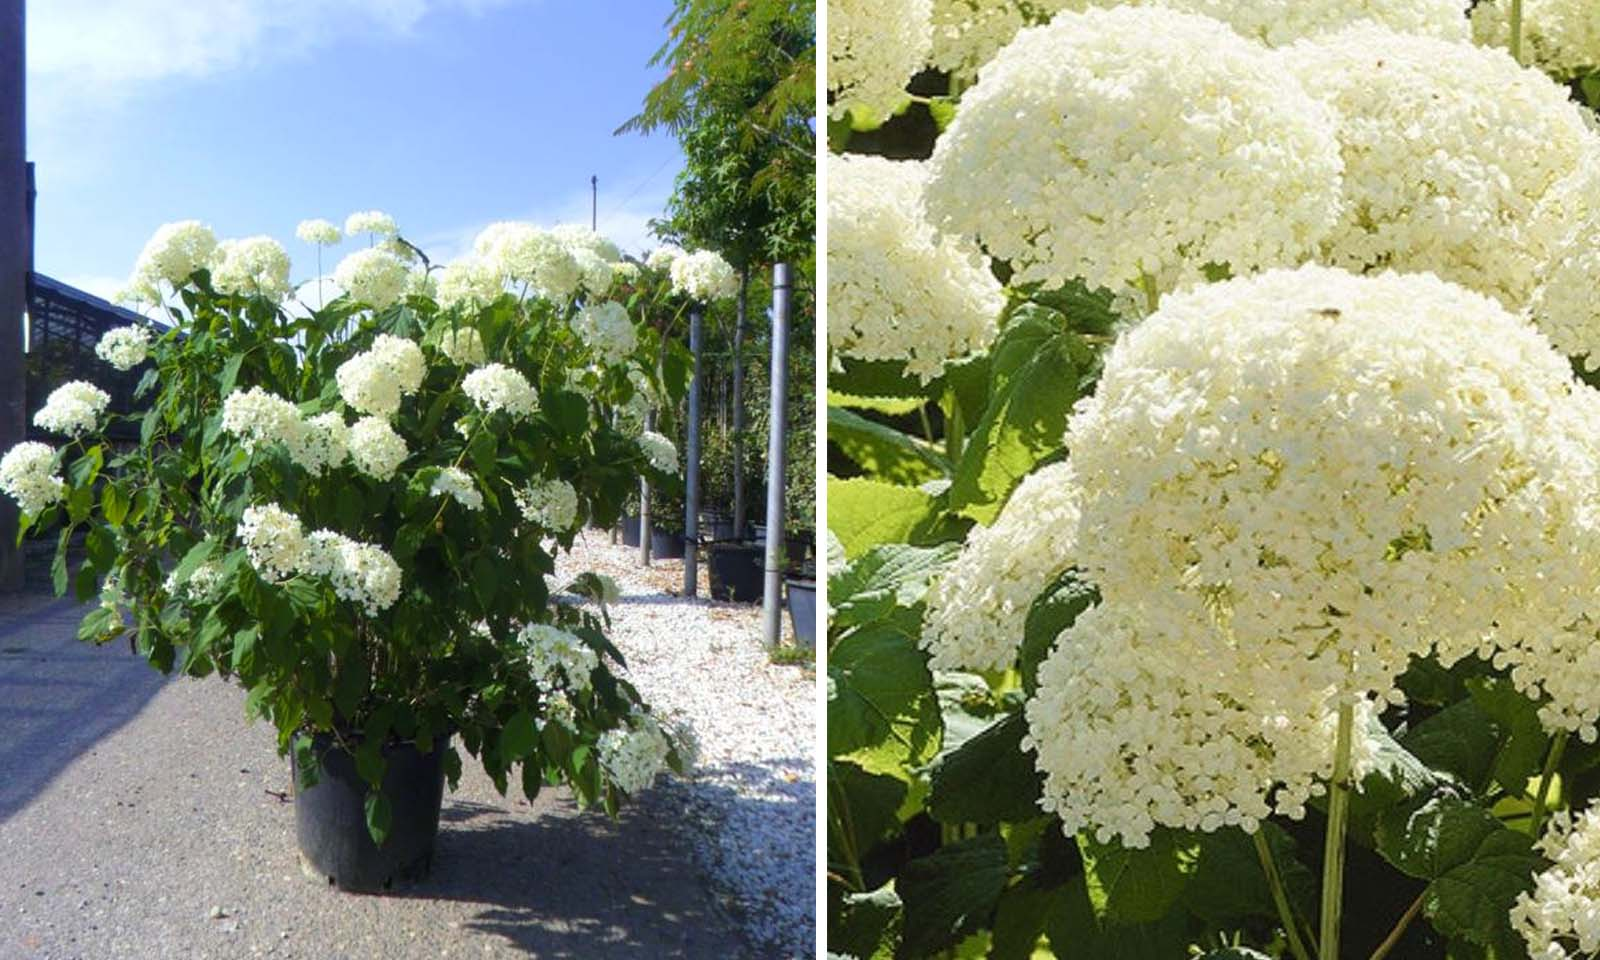 Hydrangea Arborescens 'Annabelle' (Hydrangea 'Annabelle') - Shrub